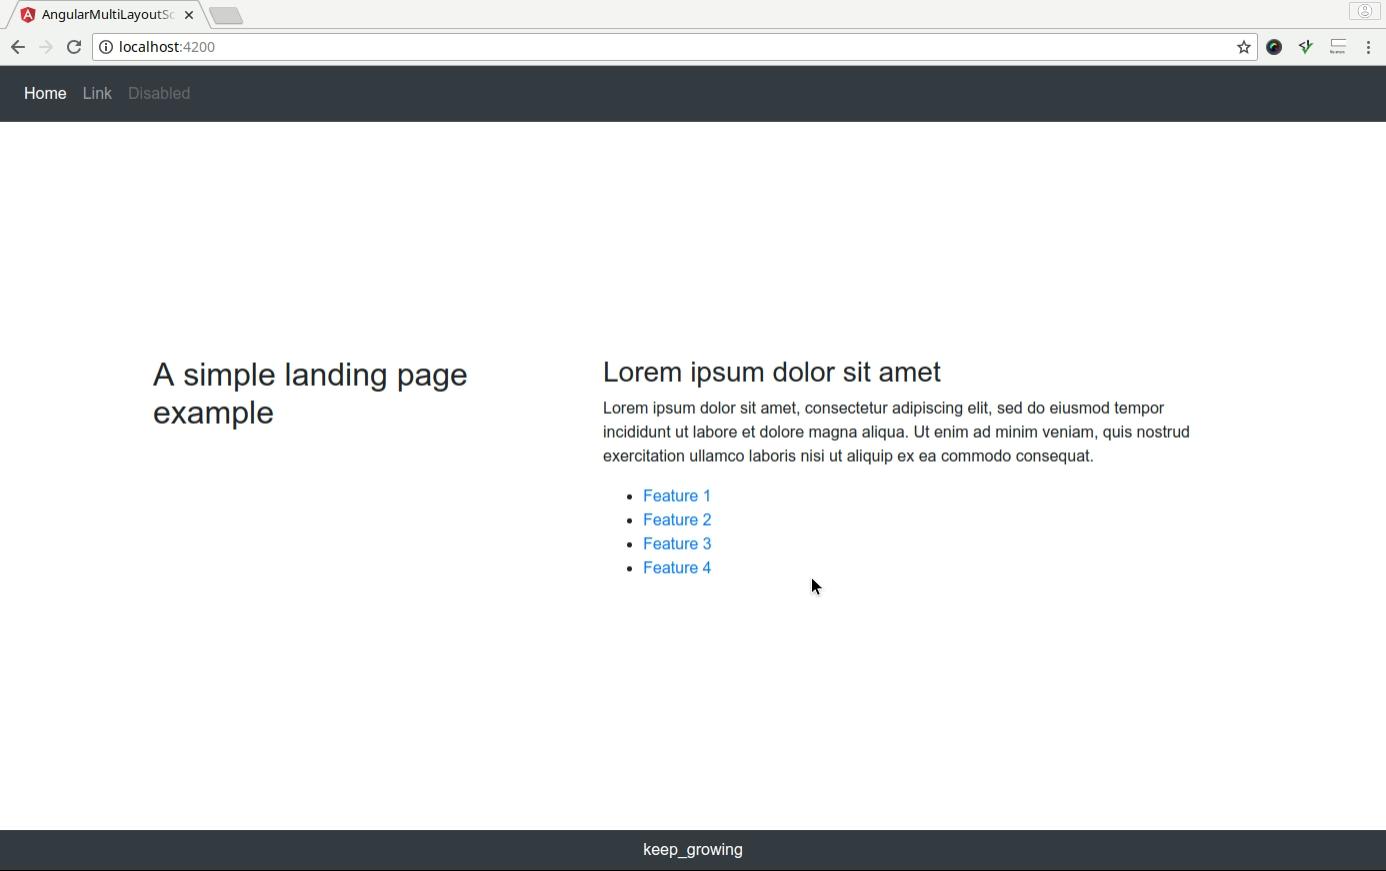 The landing page screenshot